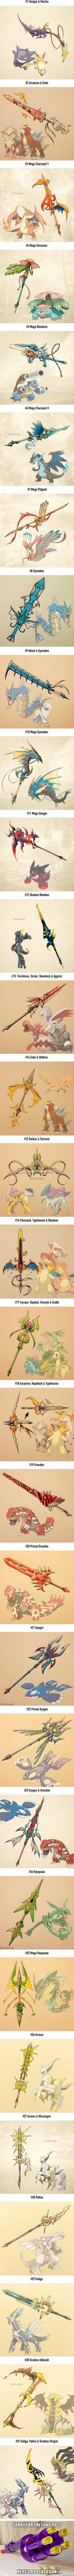 Artist Turns 31 Pokémon Into Poké-Weapon (By Rico Busalpa)